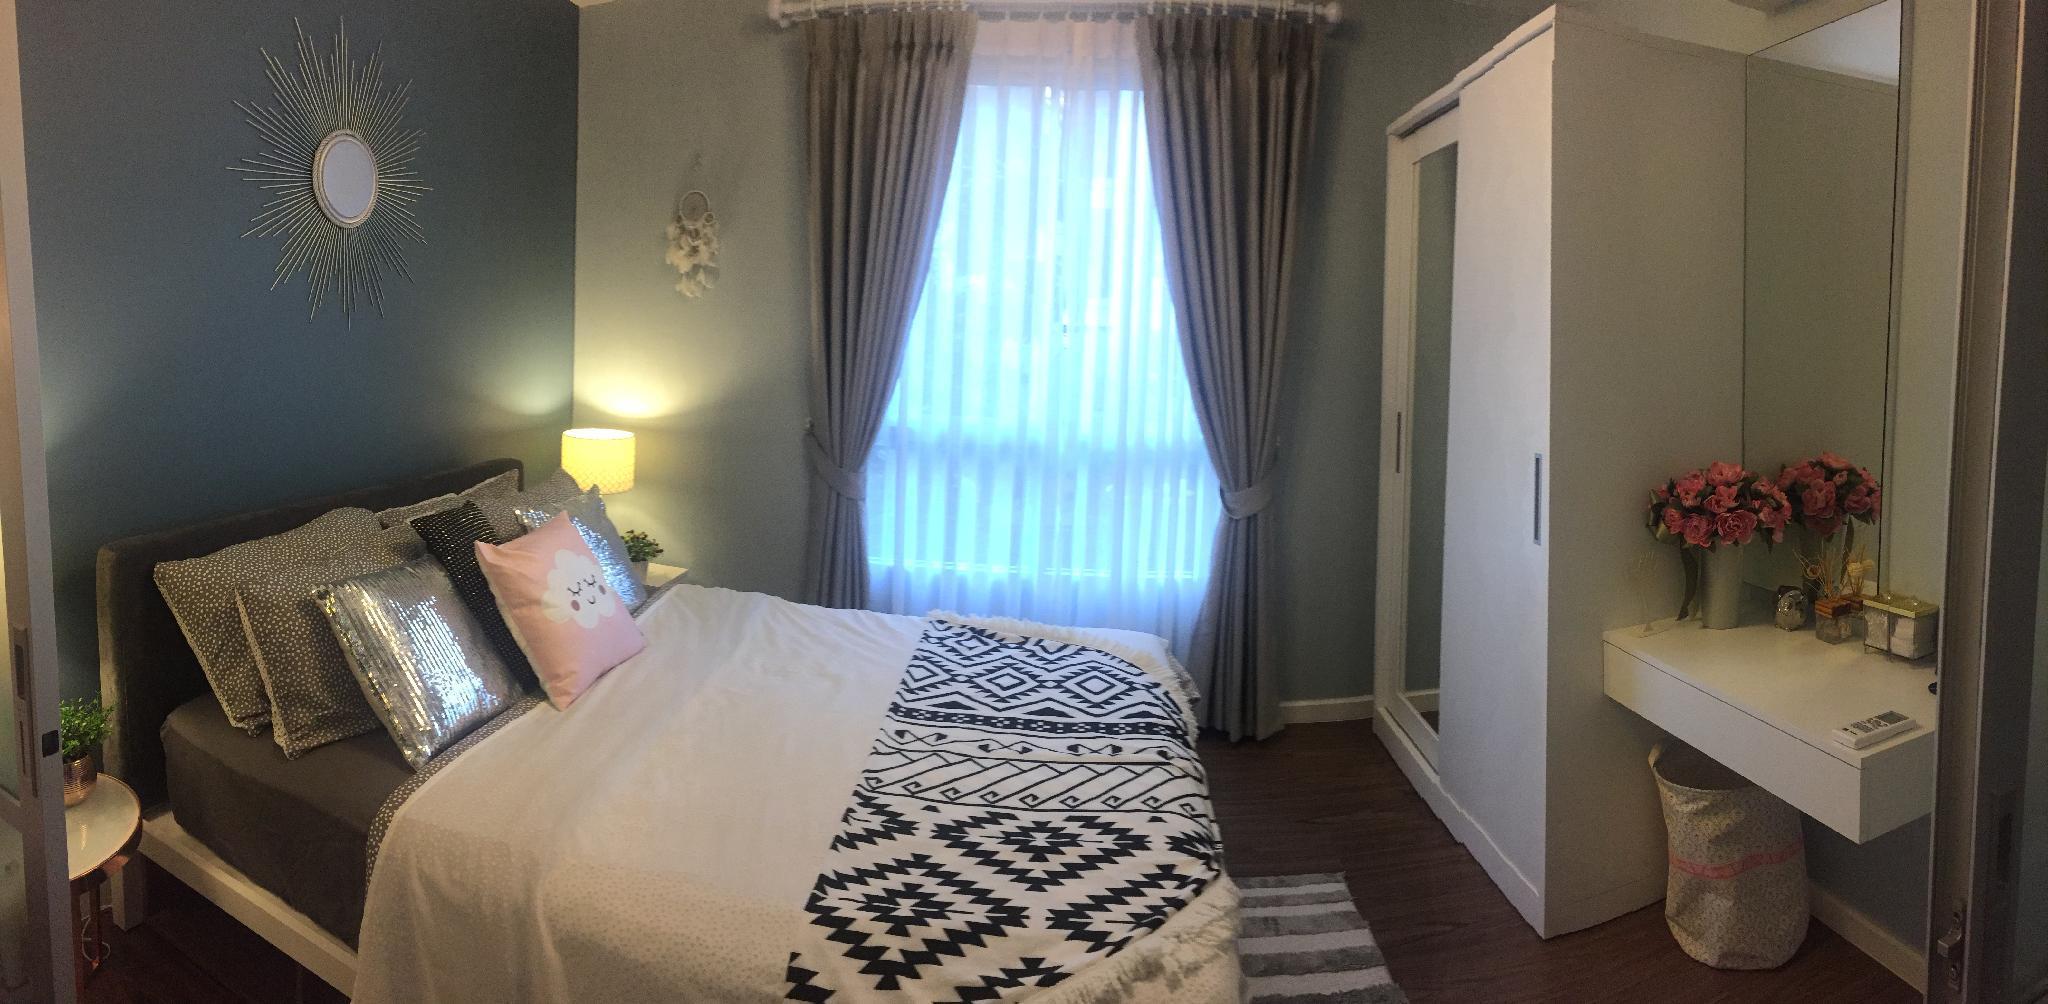 Nice And Cozy Room